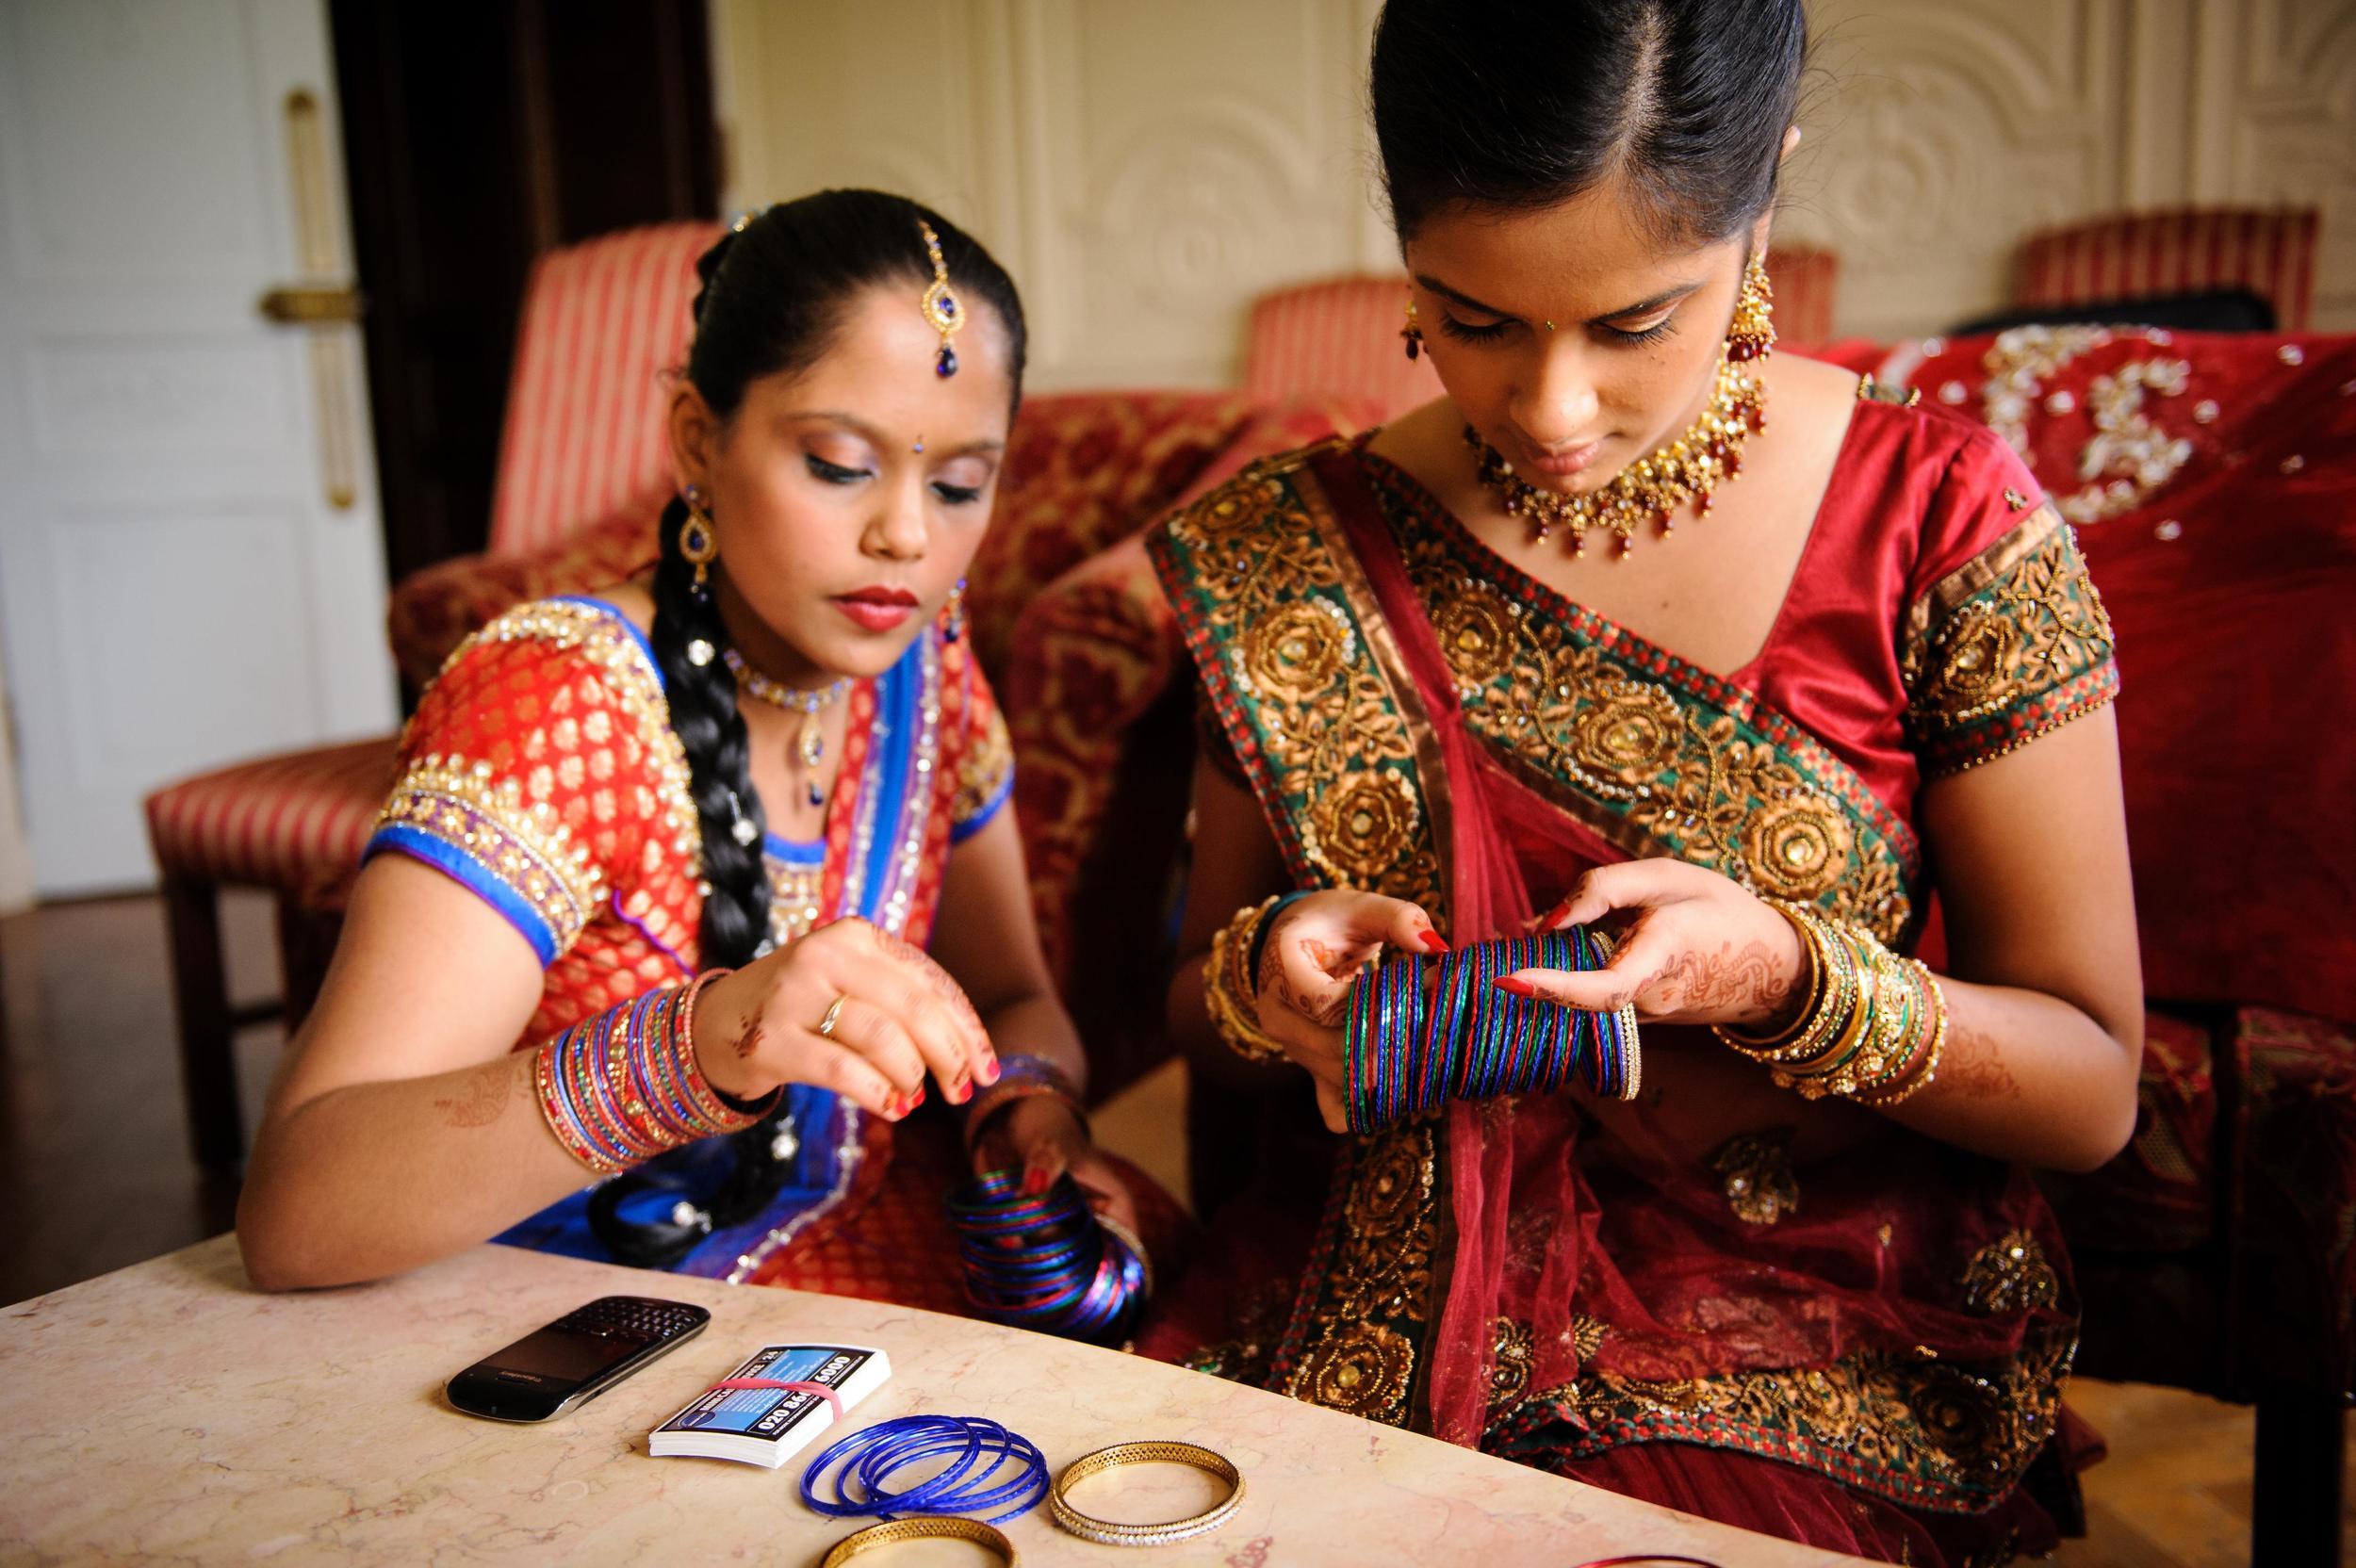 payal_and_bhavik_wedding-26.jpeg